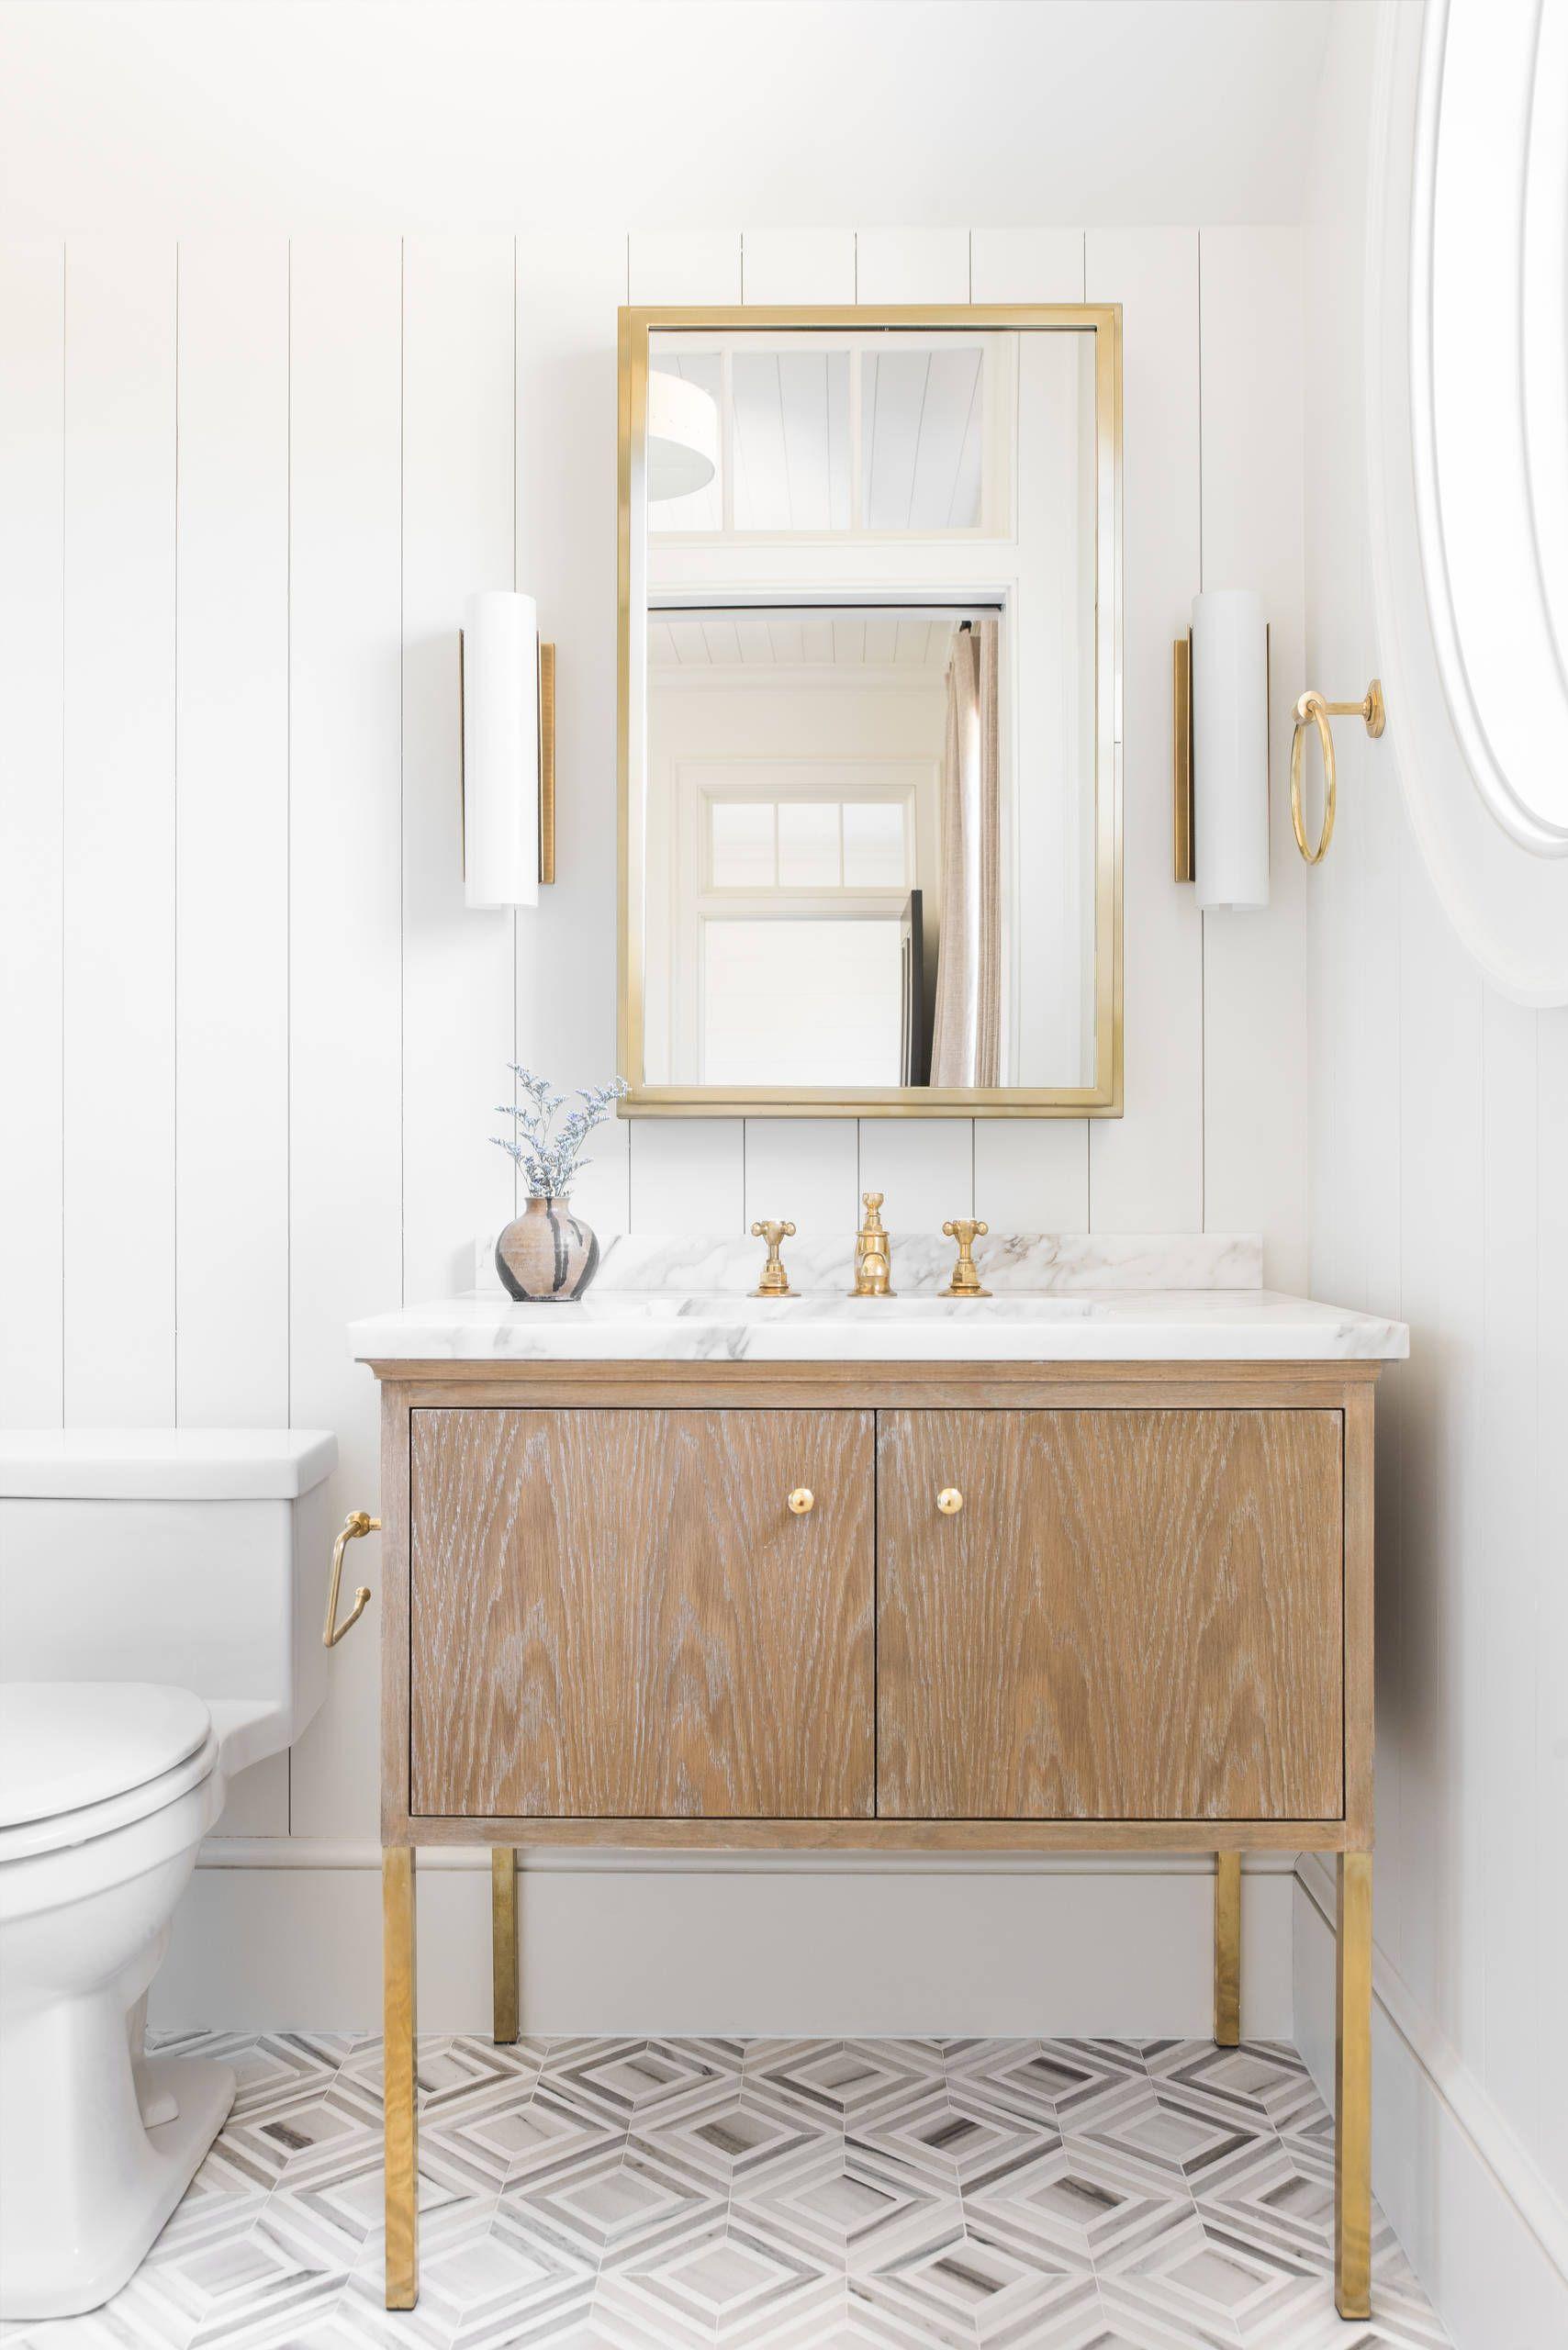 Small-vanity-lighting-idea-for-the-beach-style-bathroom-54766